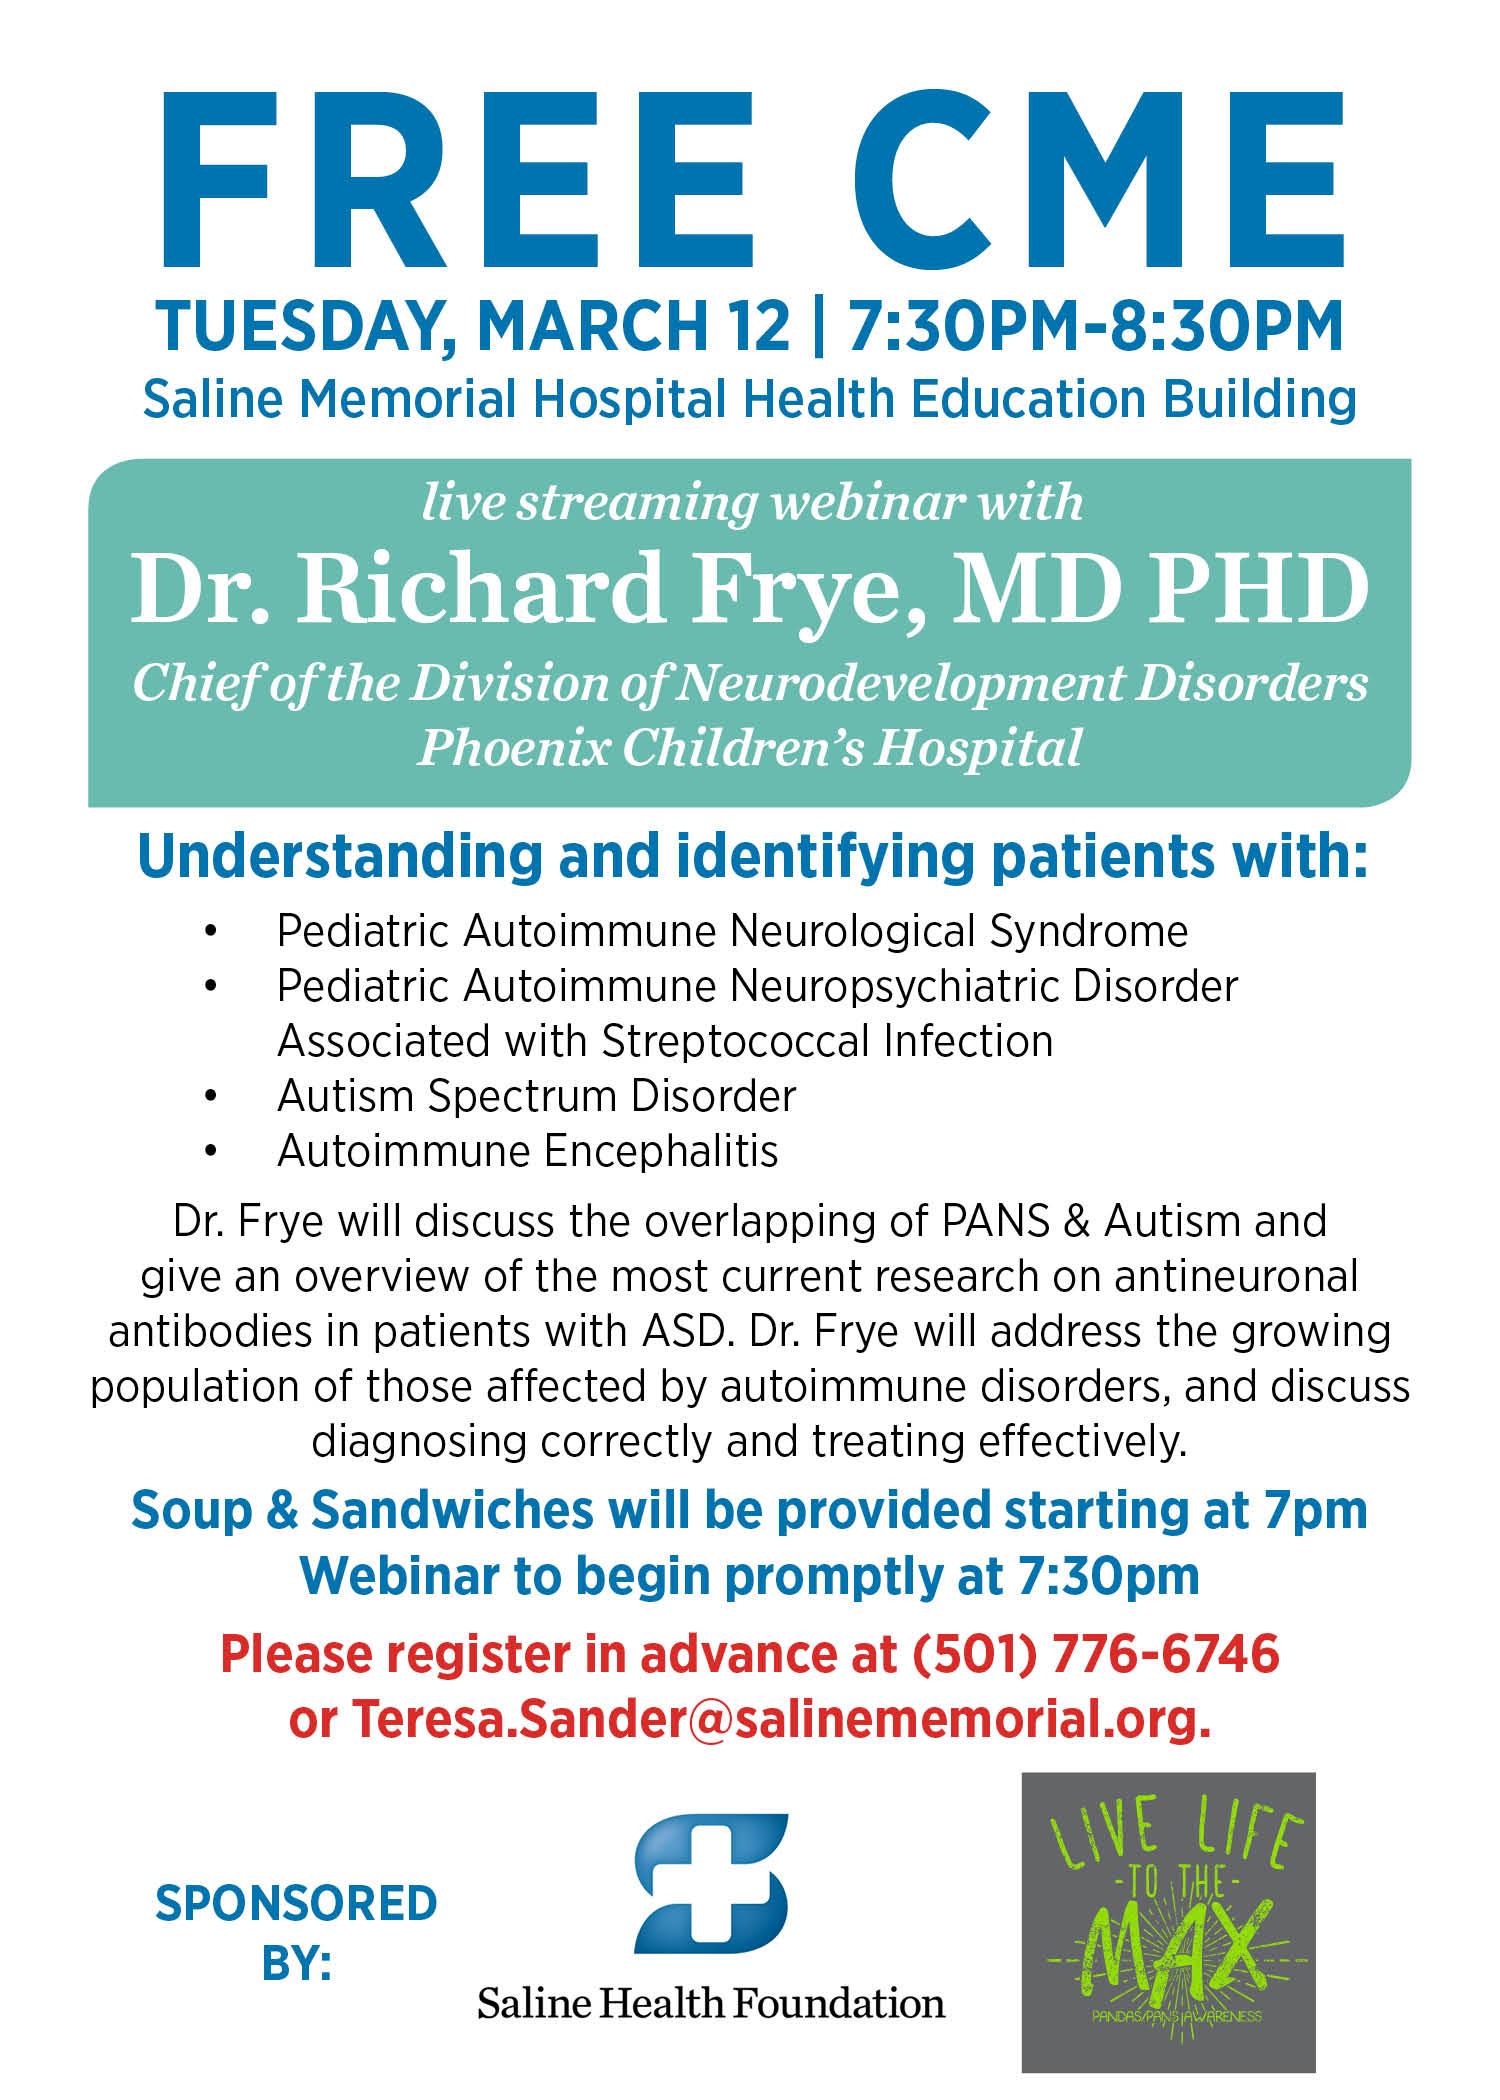 SHF0319-001 Dr. Frye Invite REV2.jpg